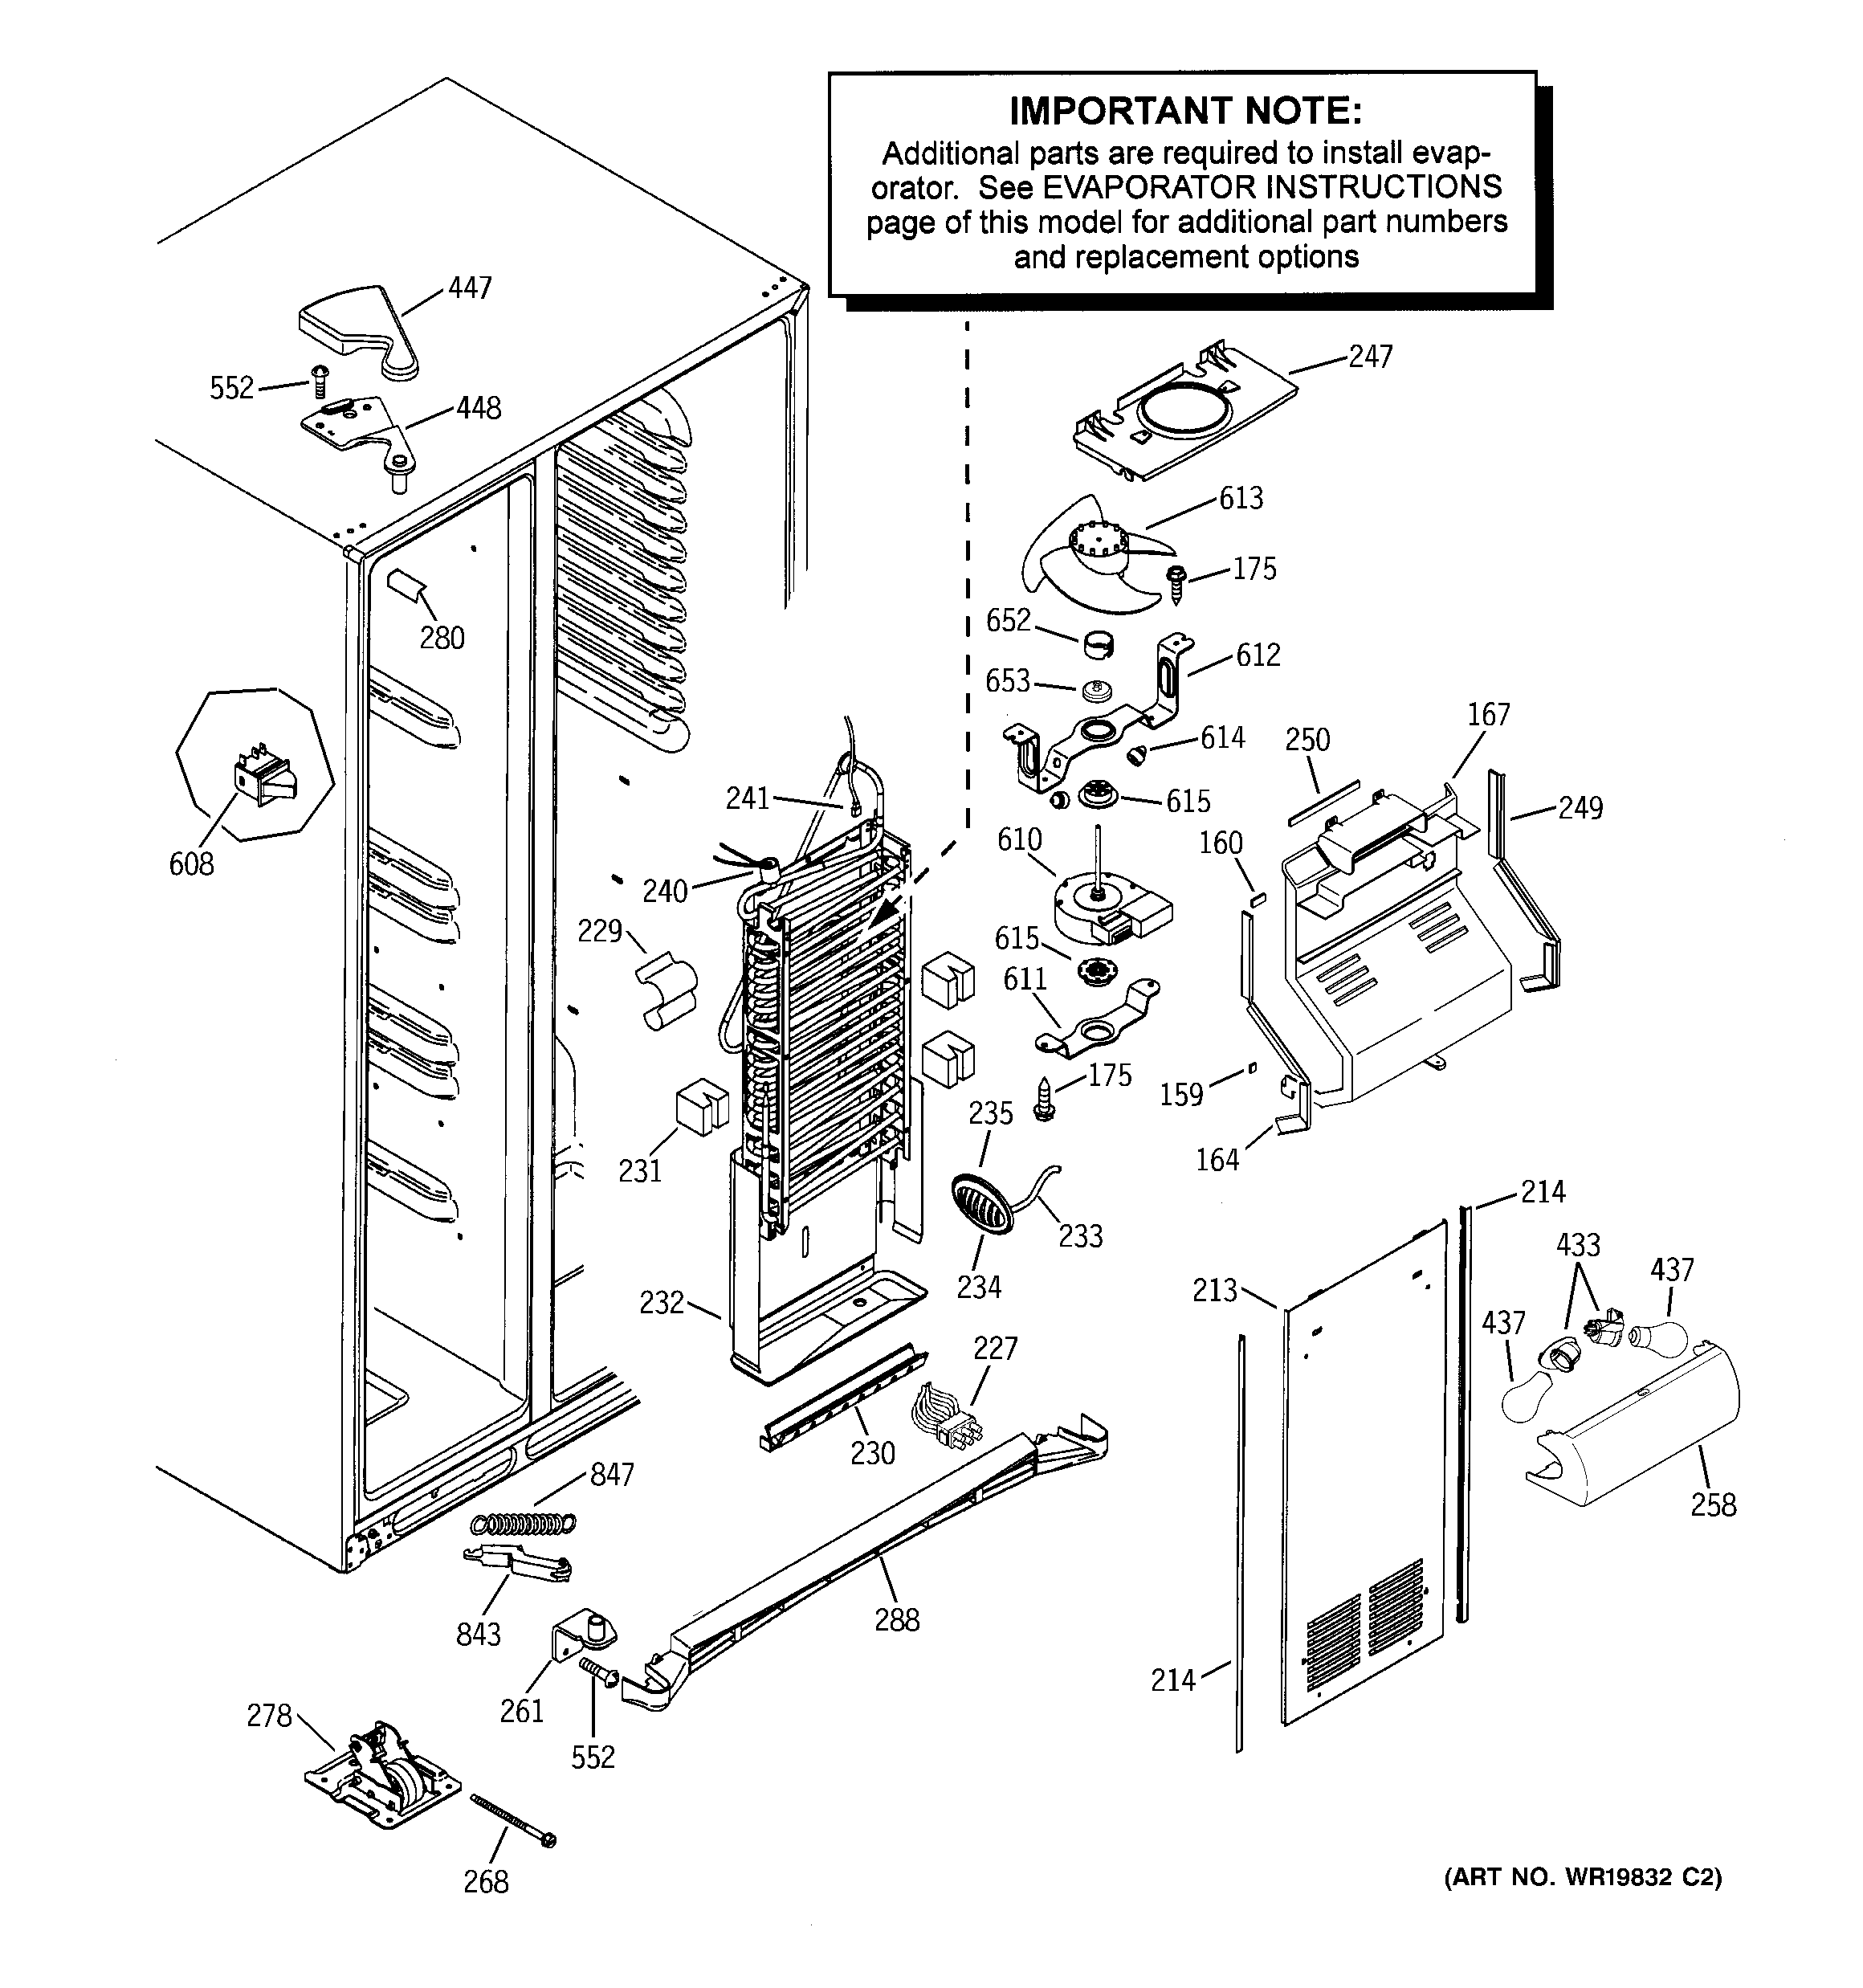 RL_5439] By Side Refrigerator Parts Diagram On Ge Refrigerator Wiring  Diagram Free DiagramNful Drosi Waro Rosz Nful Phae Mohammedshrine Librar Wiring 101